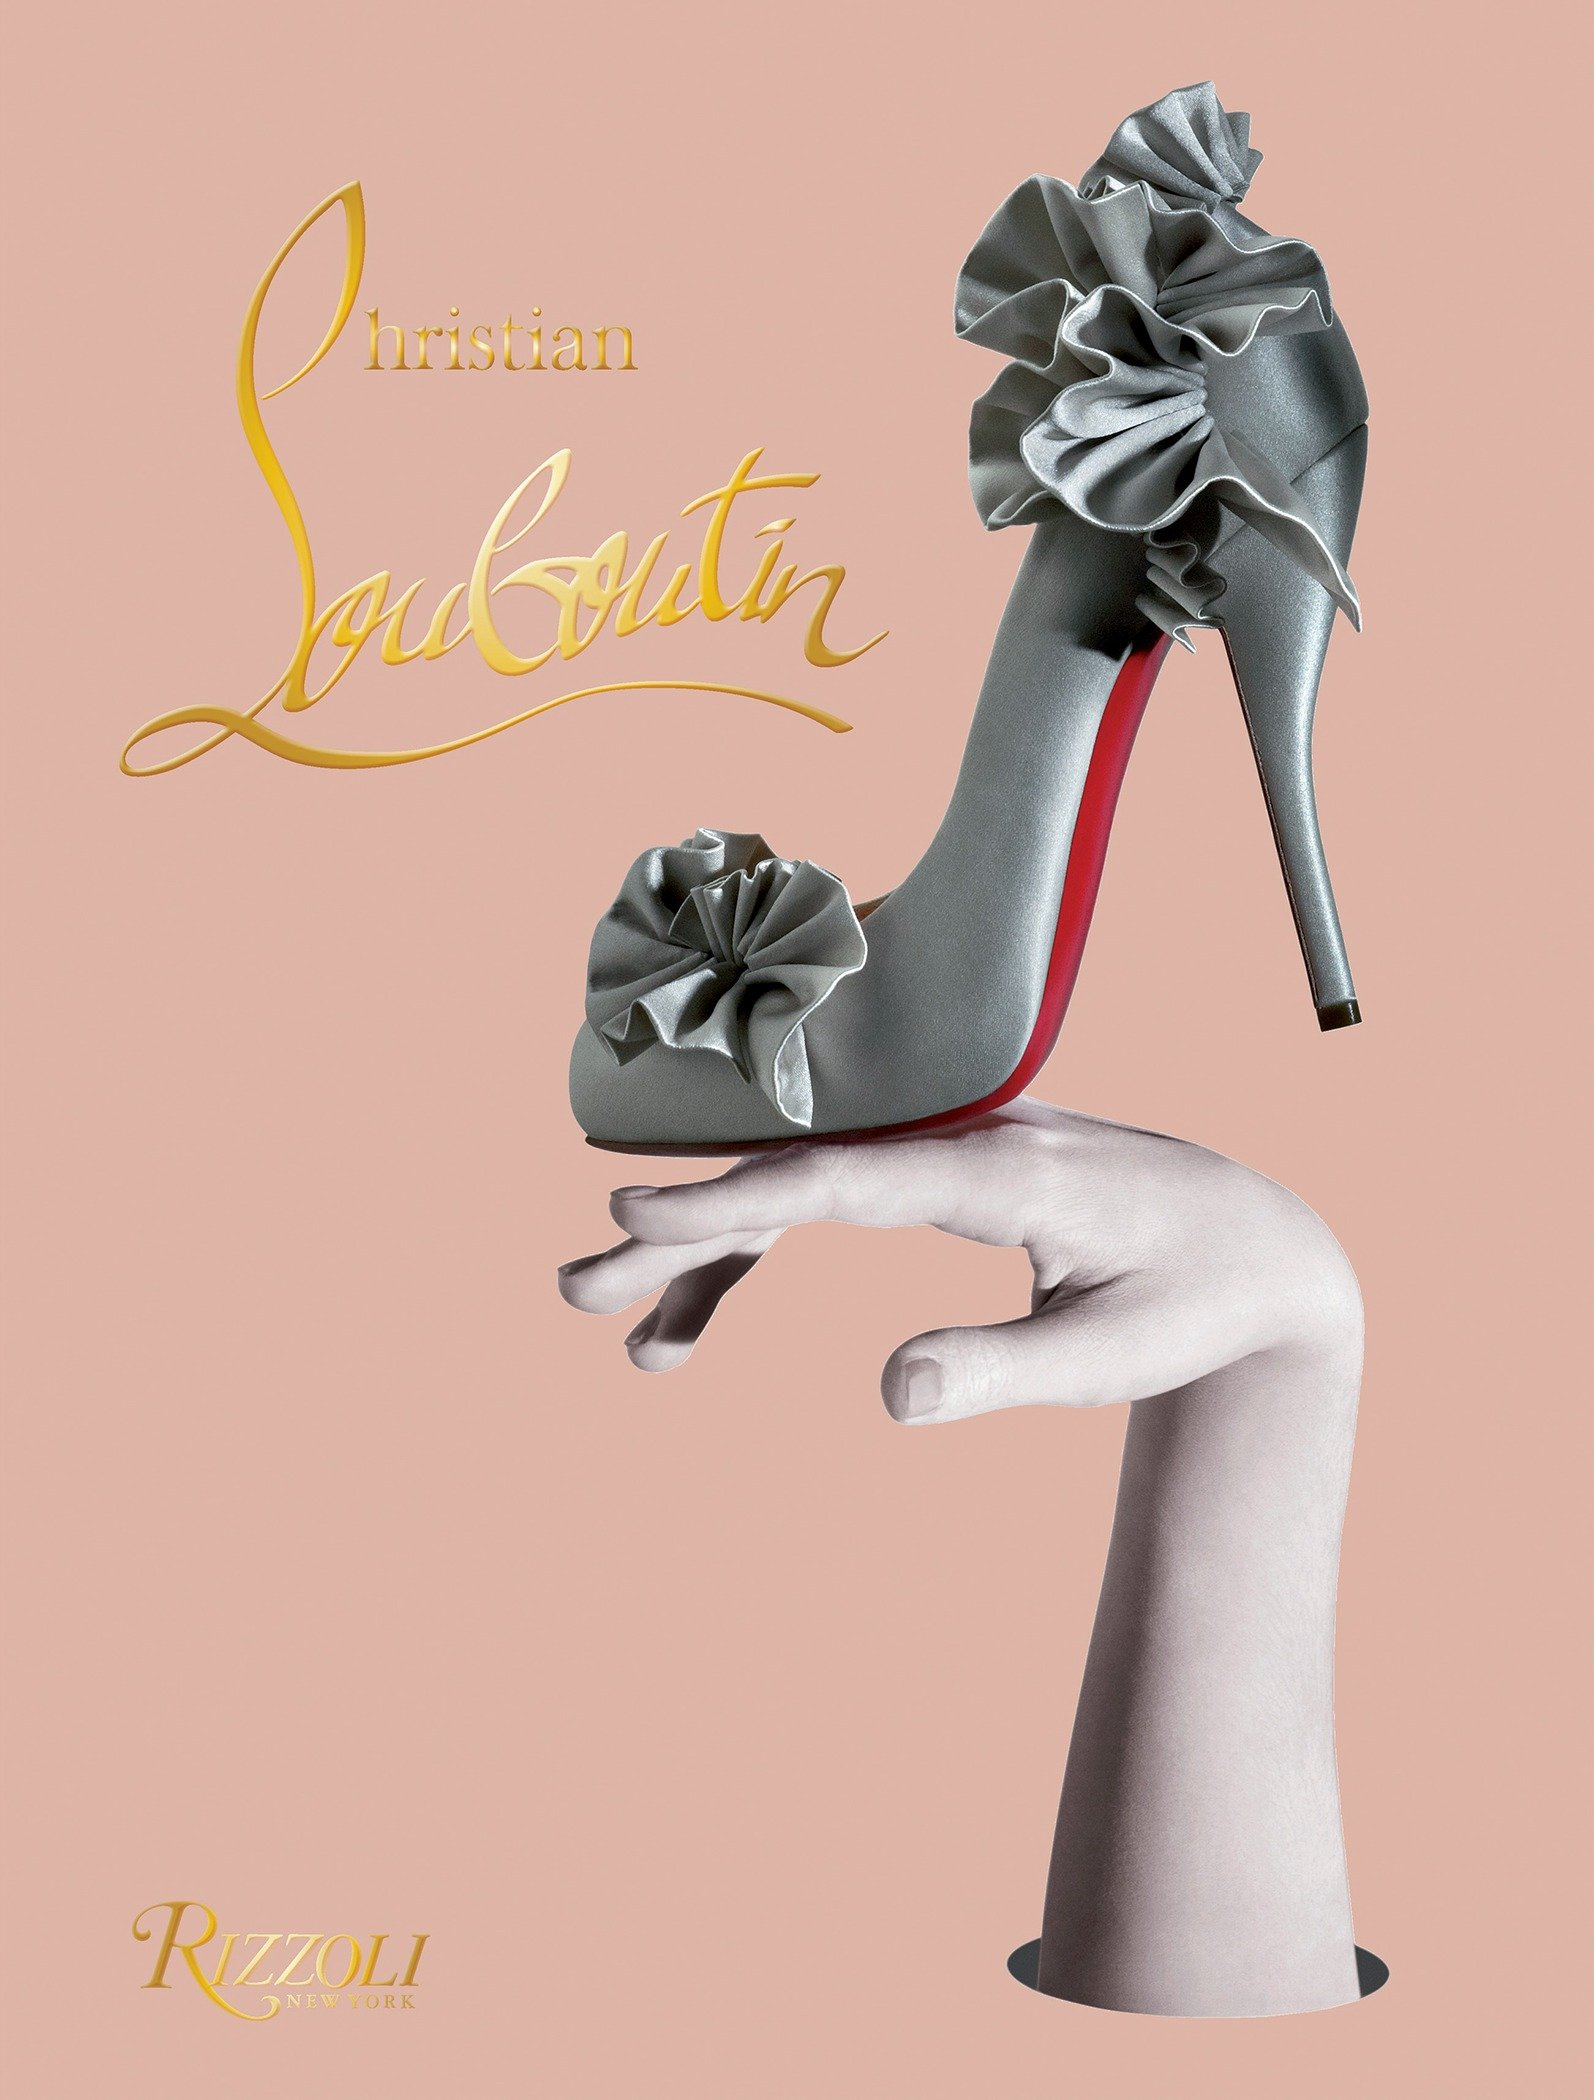 Christian Louboutin product image